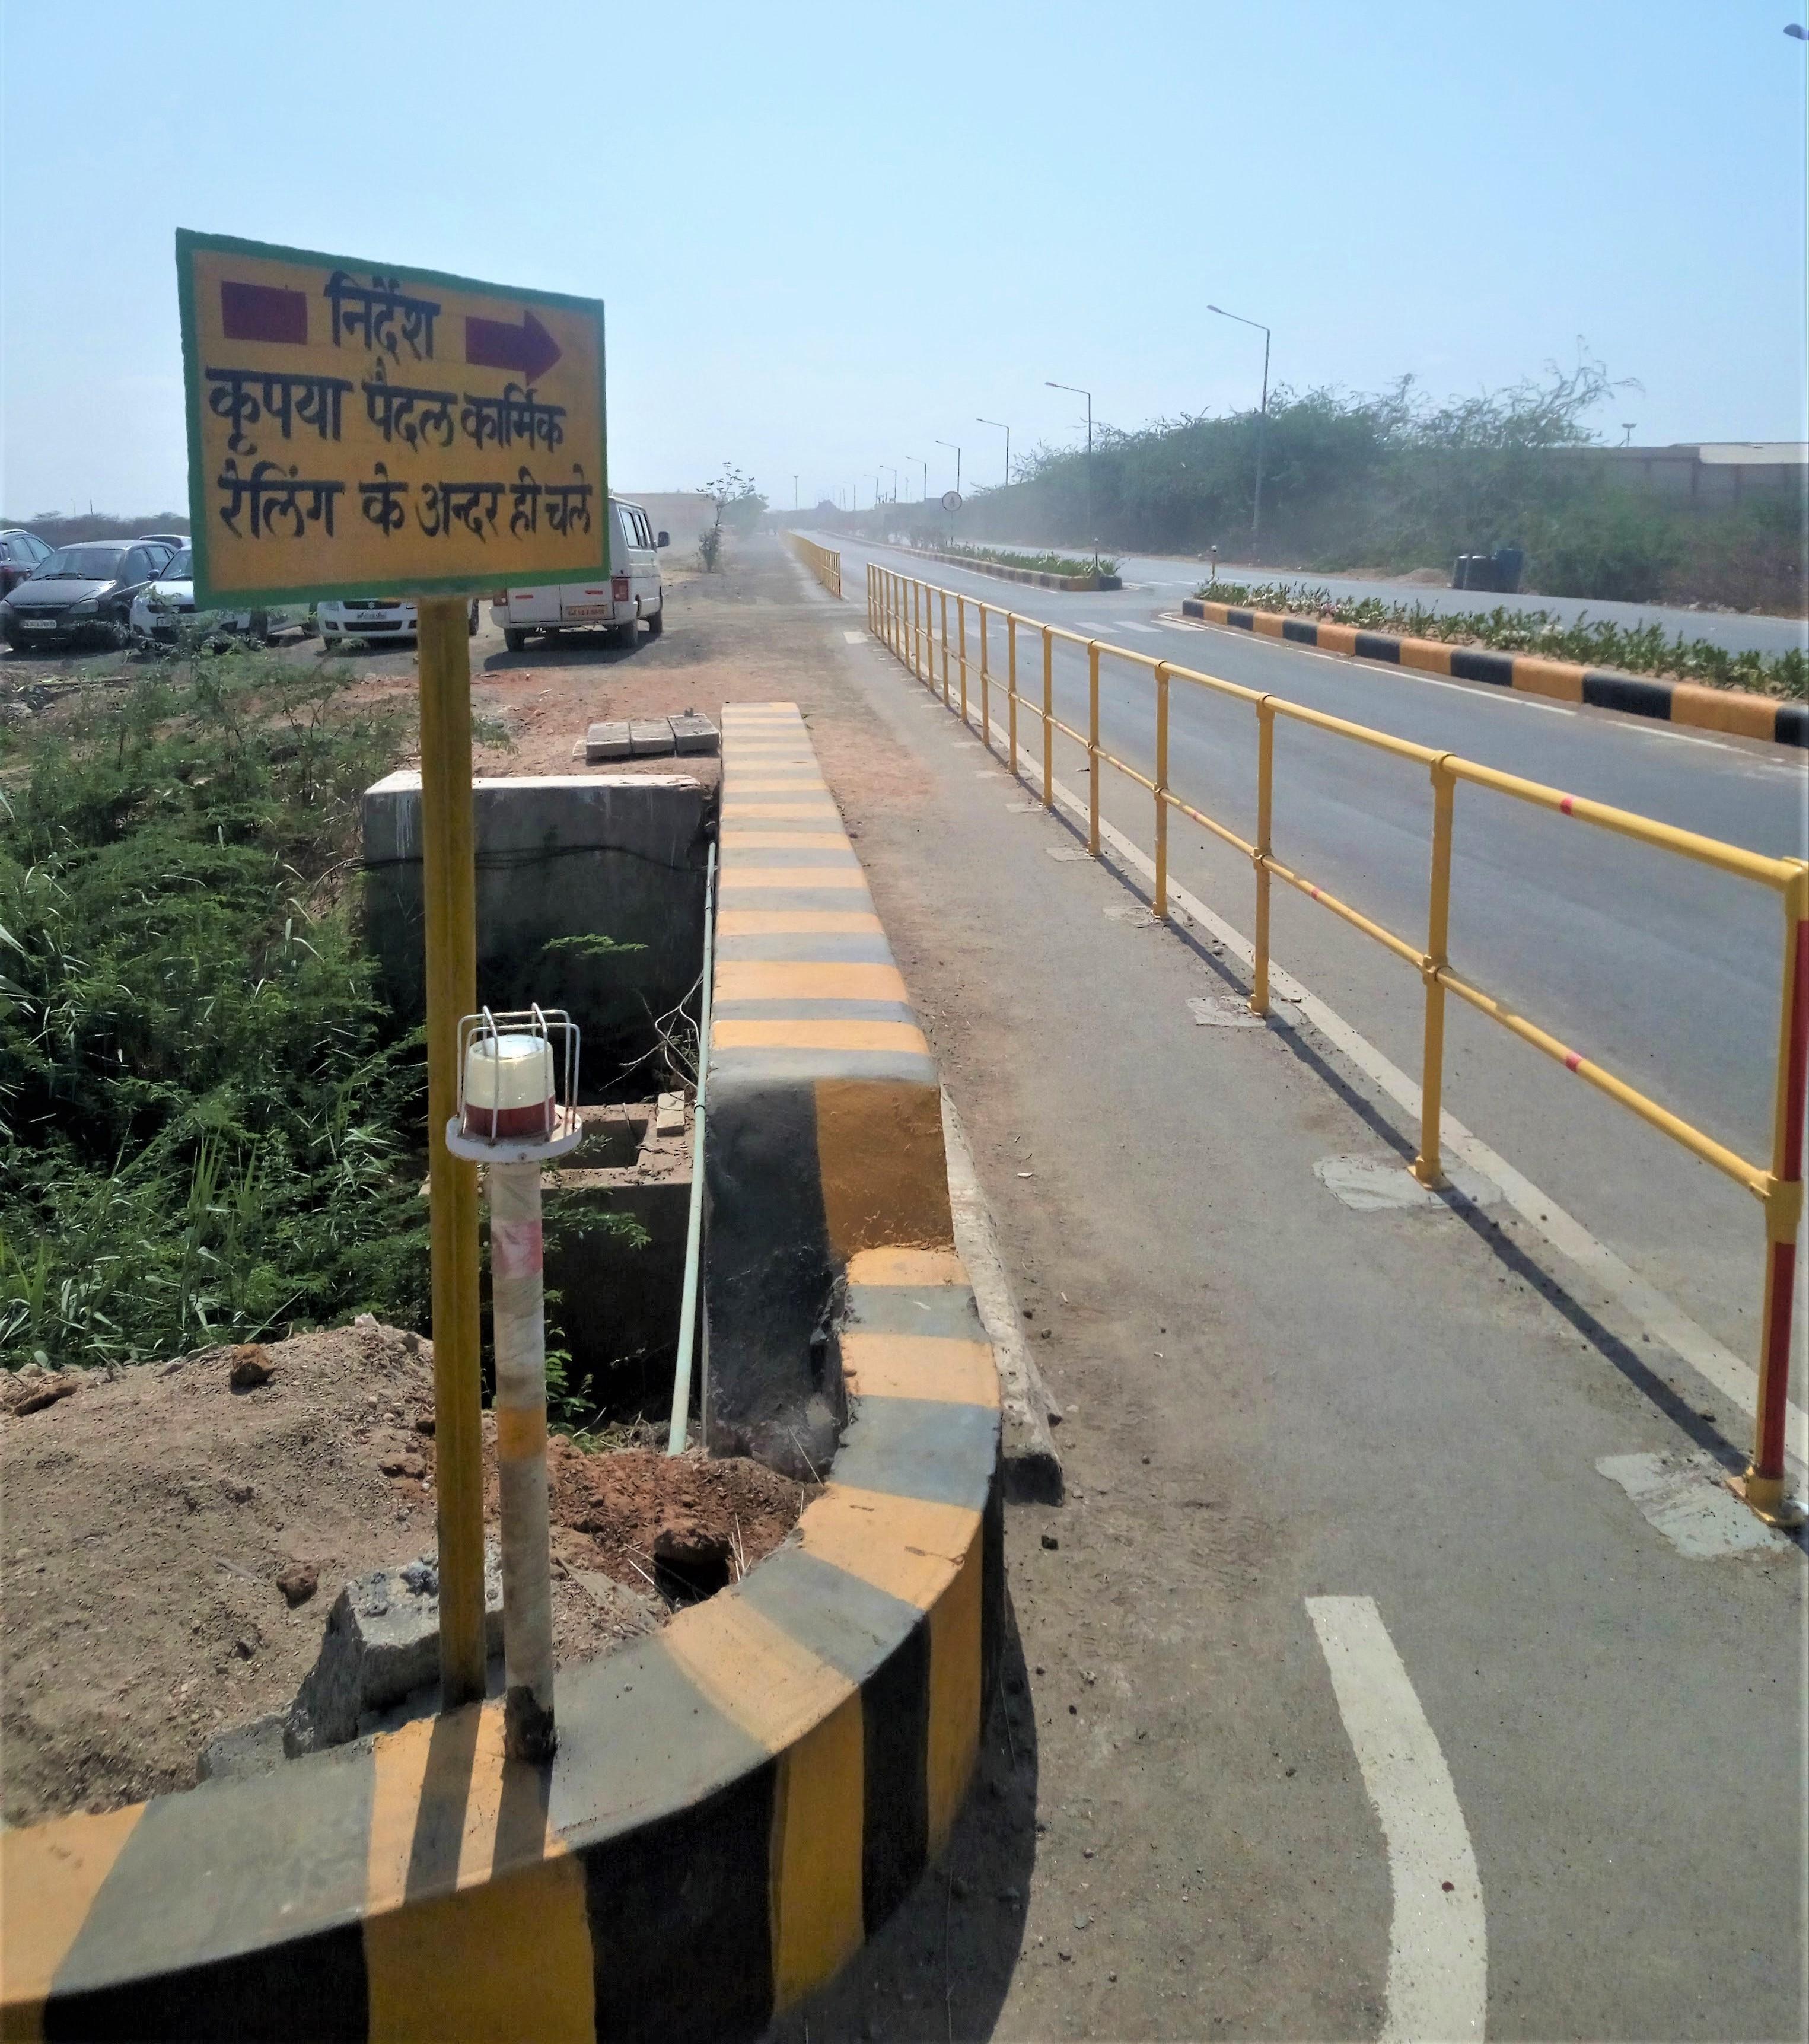 Pedestrian railing